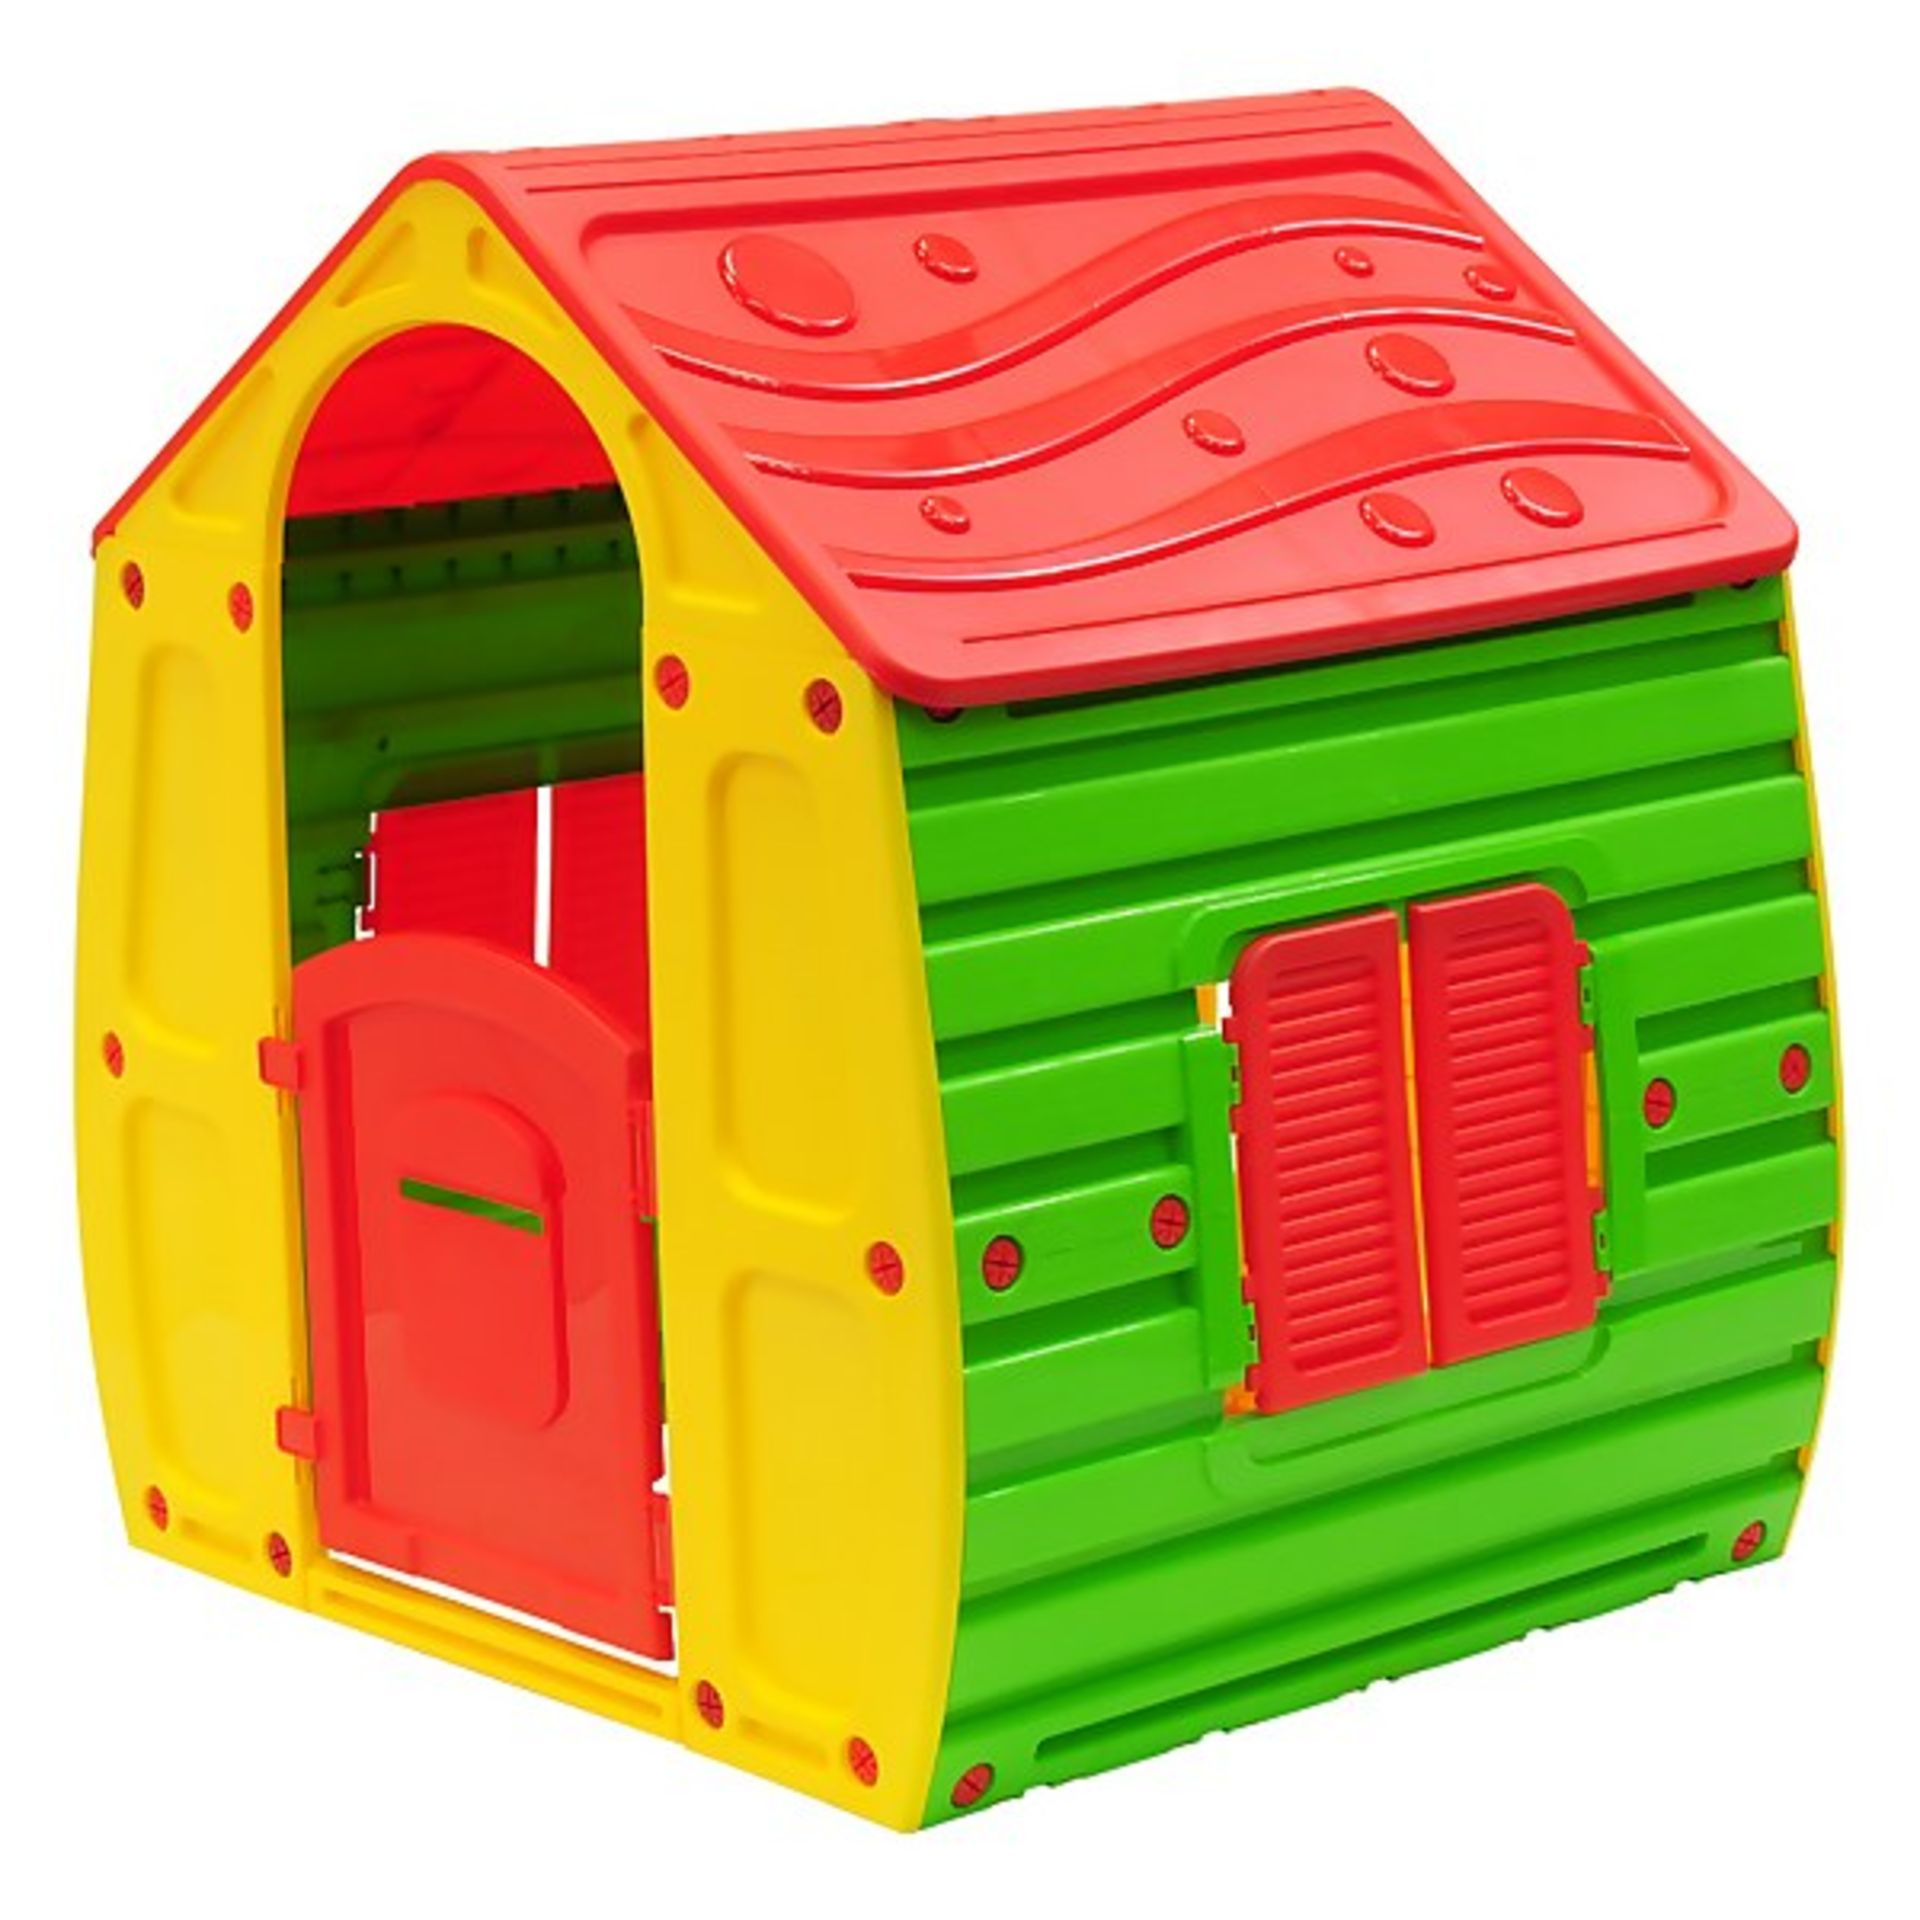 (P2) 1x Starplast Magical House (102x 90x H109cm) - Image 2 of 4